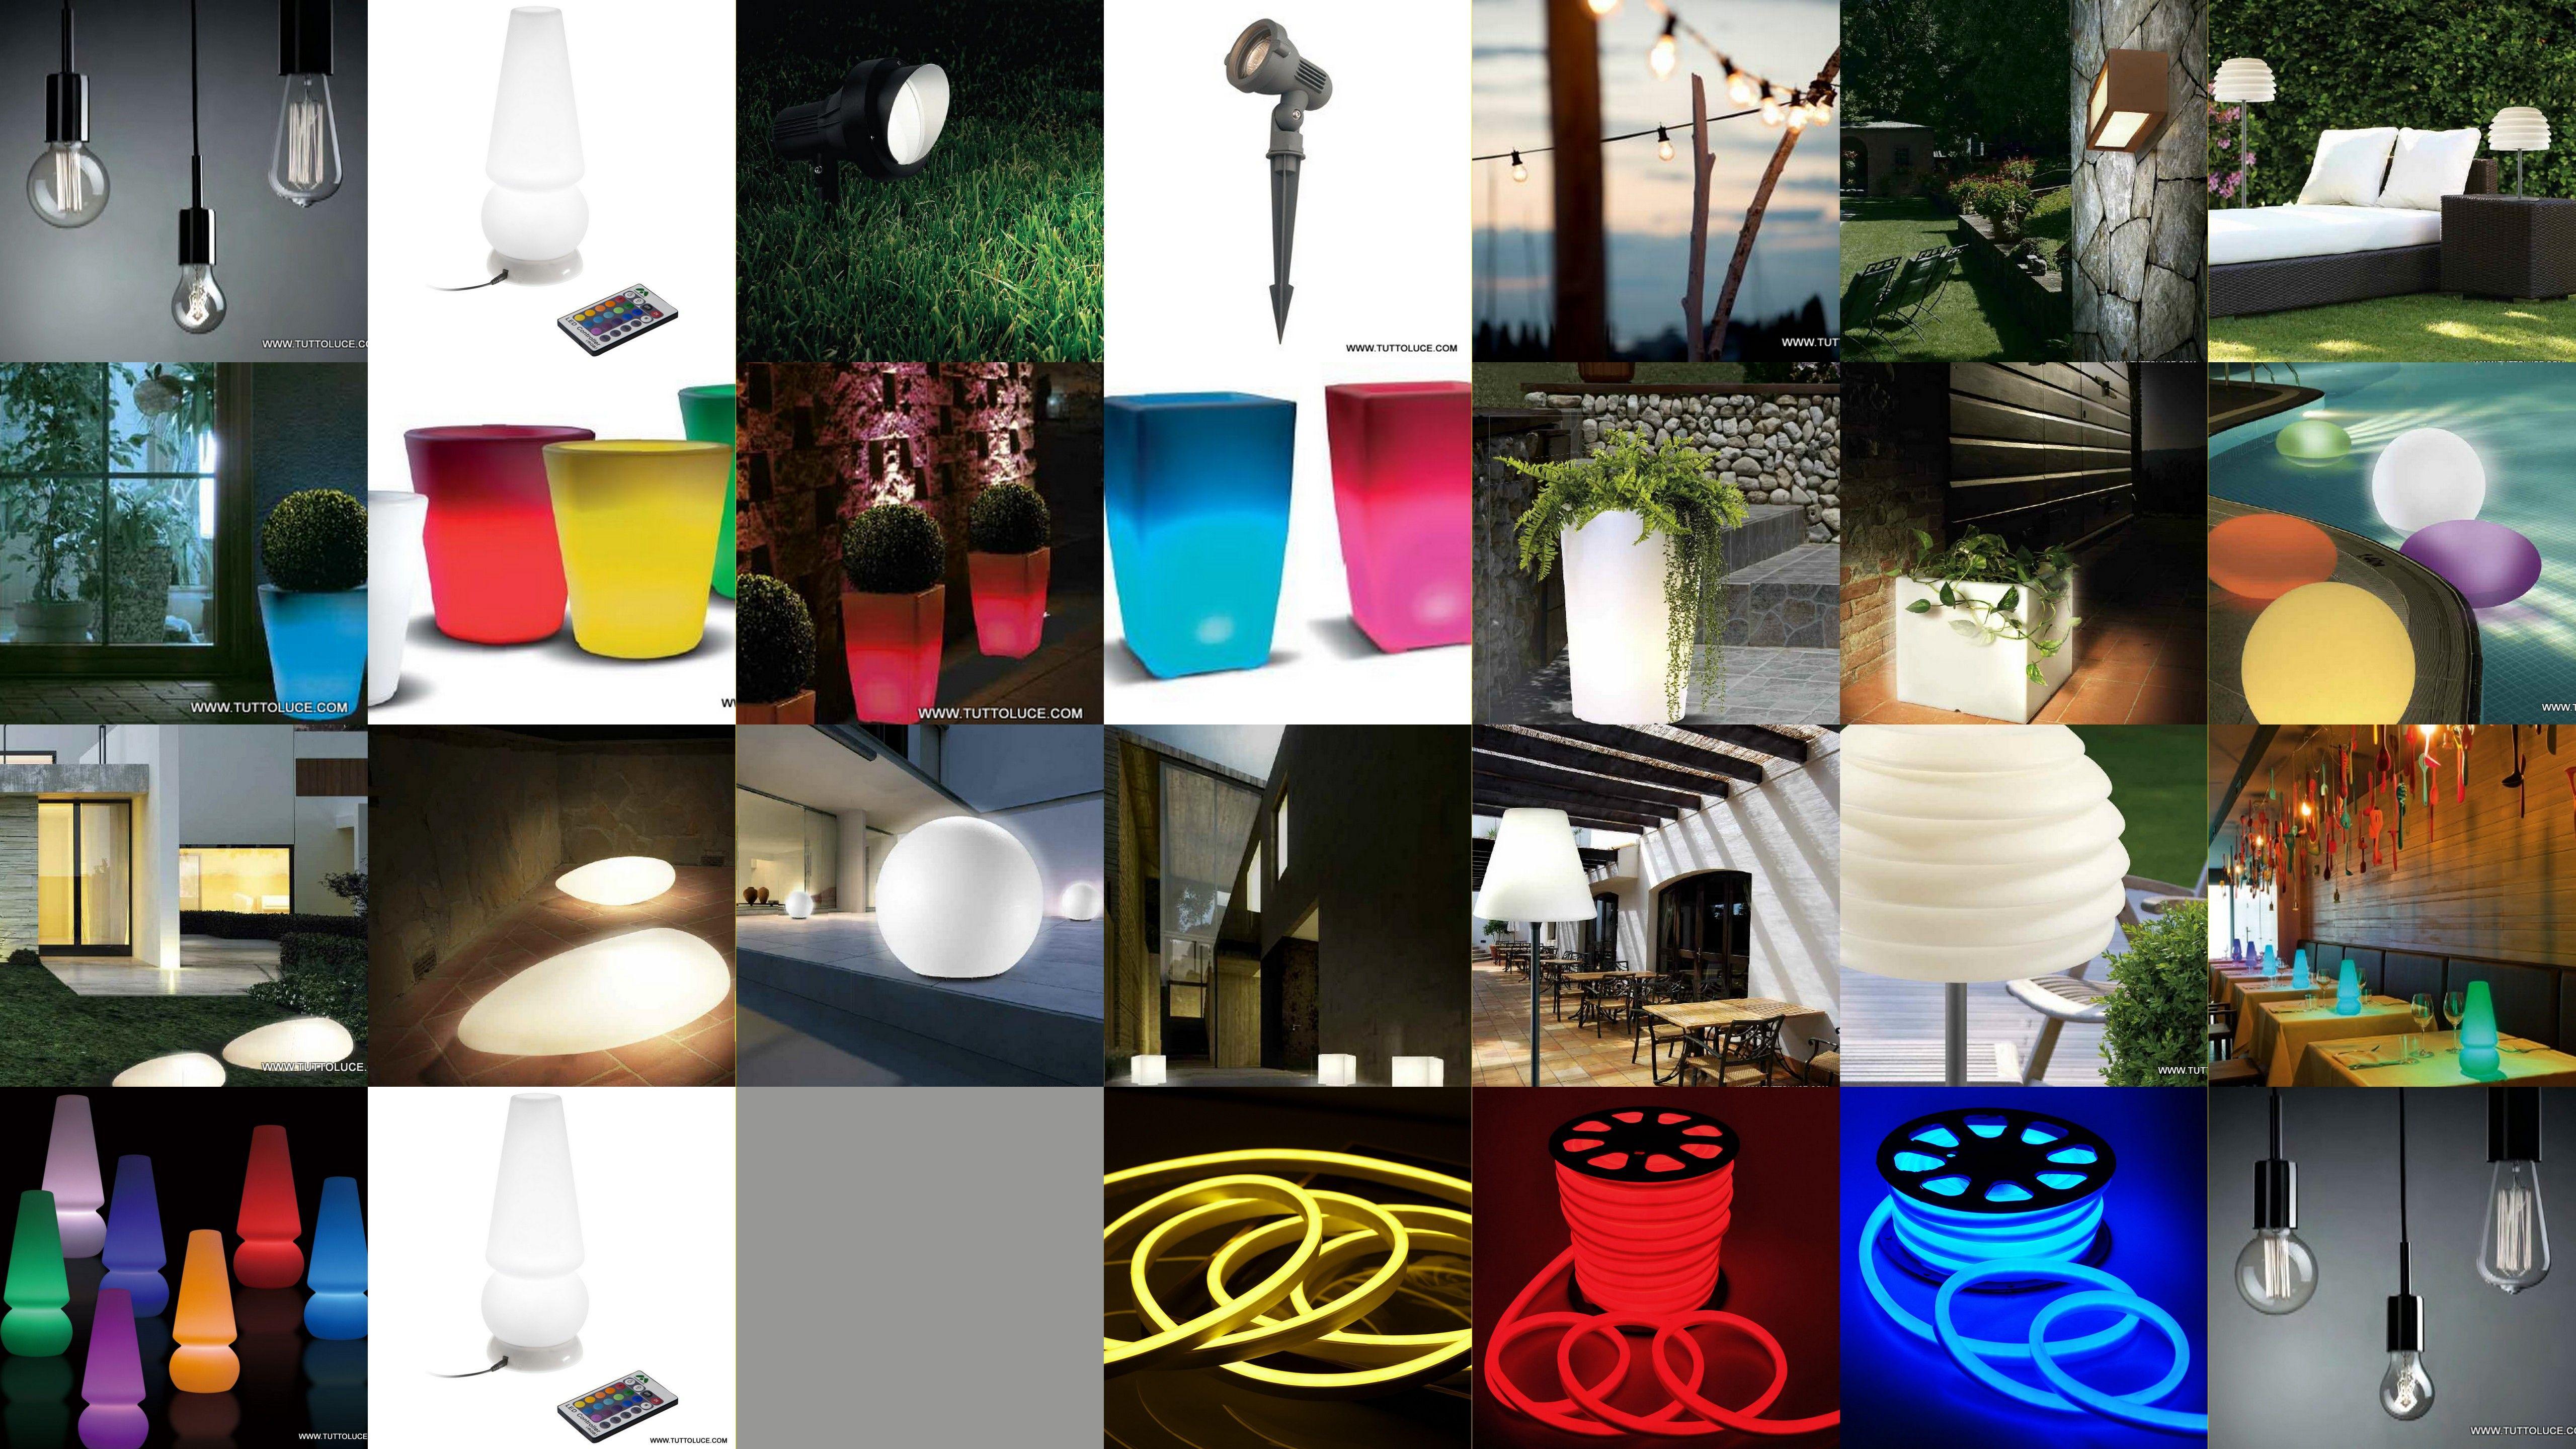 Vasi luminosi da giardino led e basso consumo luci per - Luci led esterno giardino ...